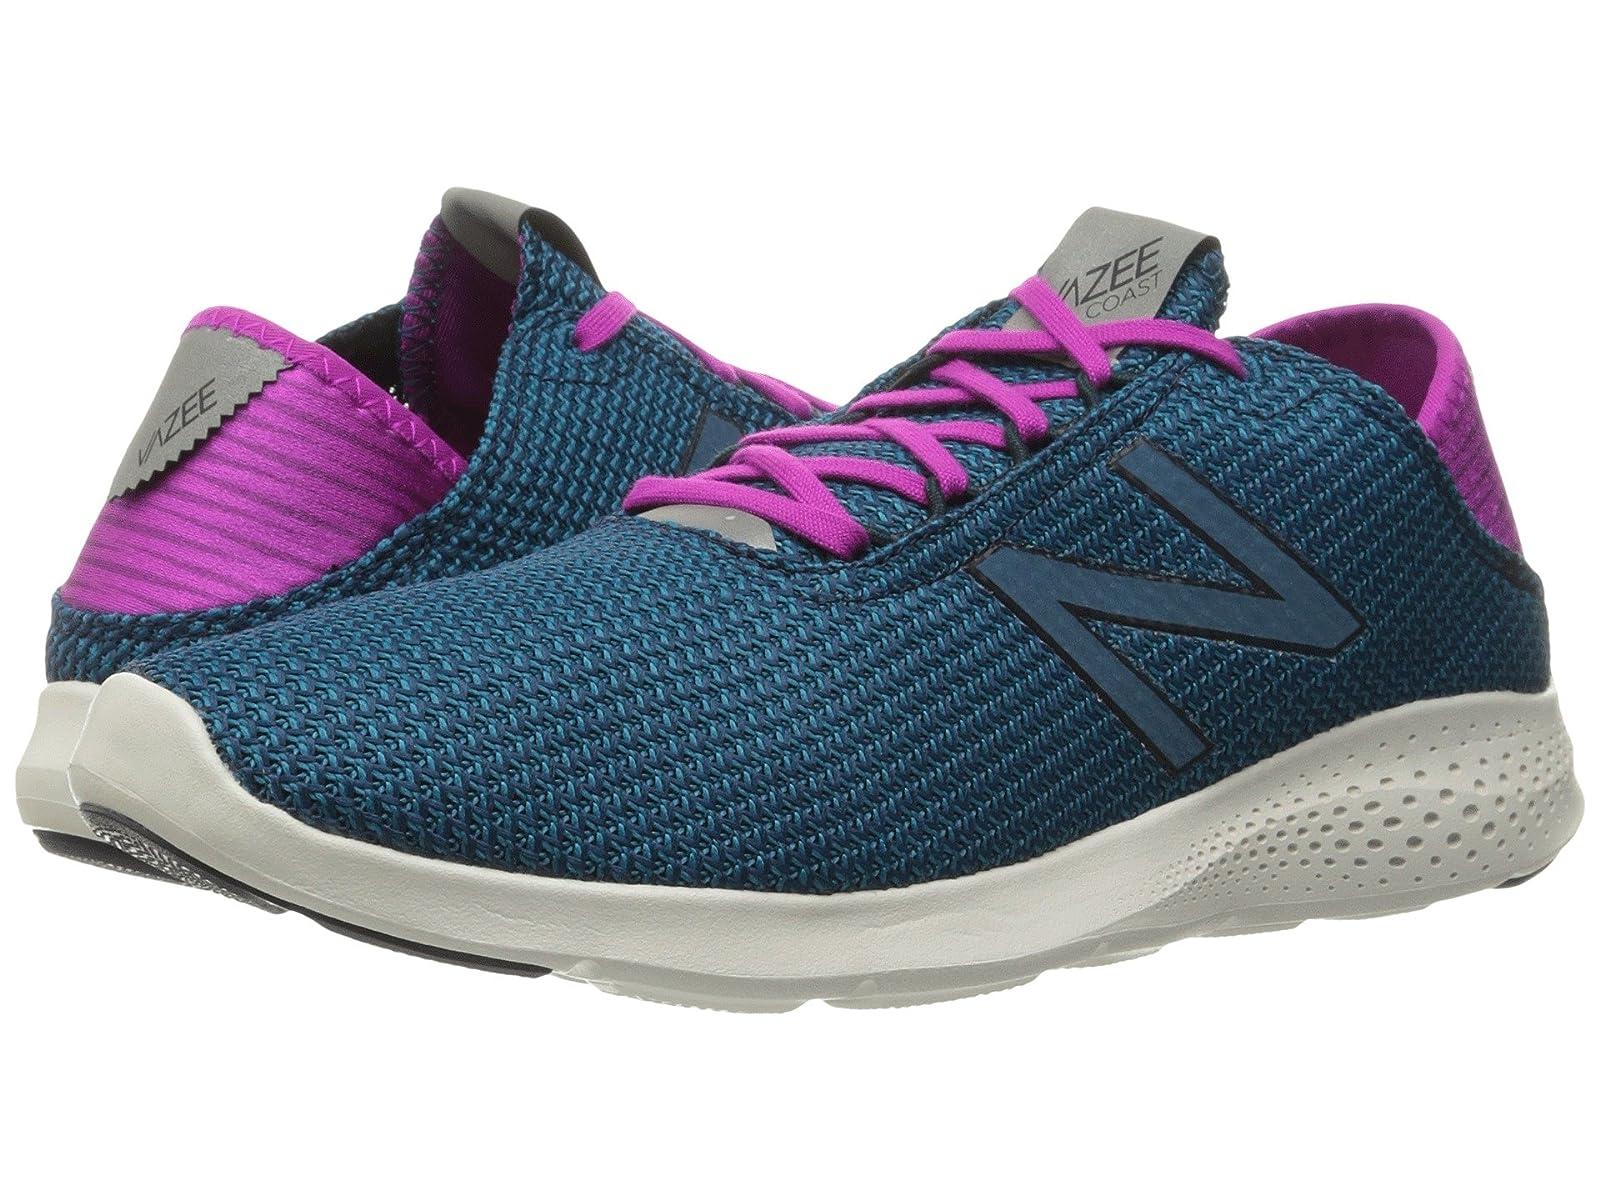 New Balance Vazee Coast v2Cheap and distinctive eye-catching shoes